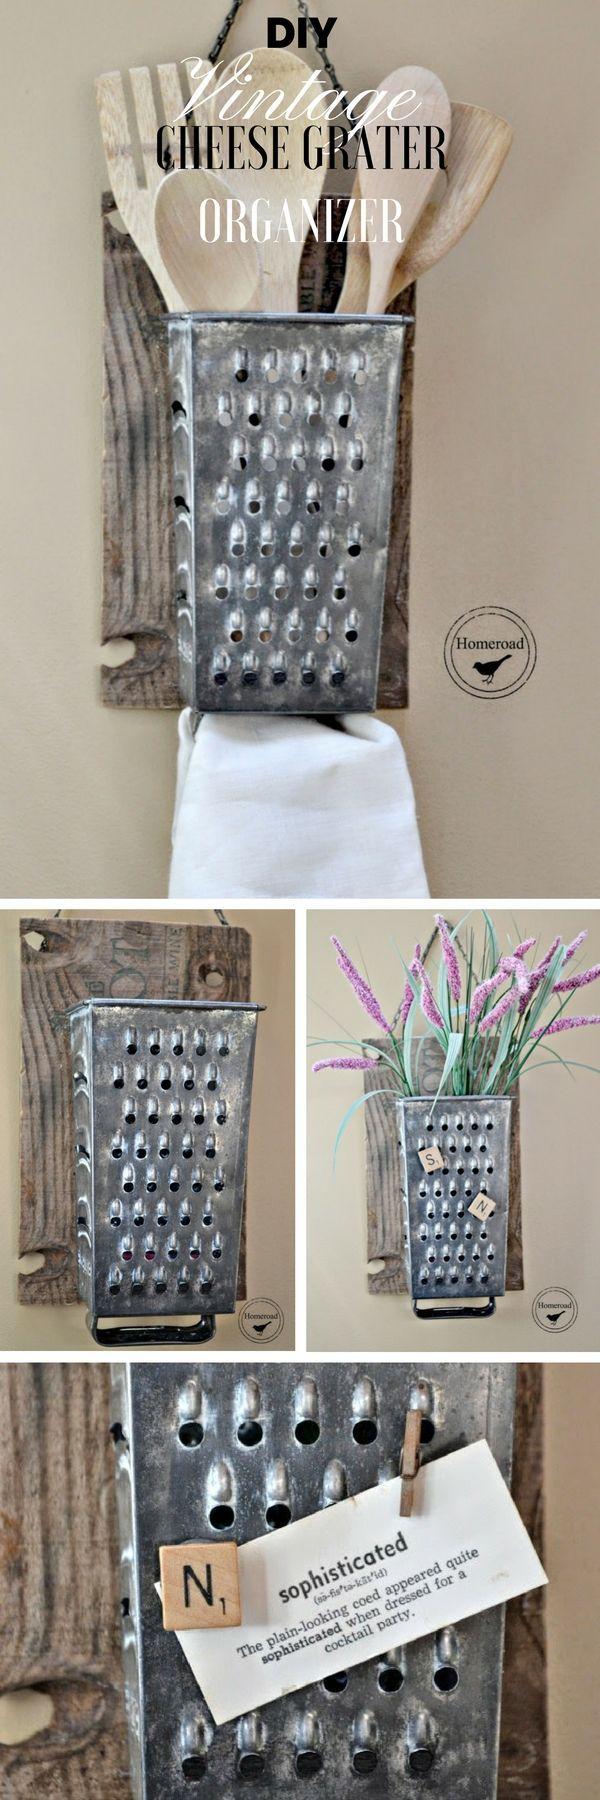 vintage diy diy kitchen ideas 25 best ideas about Vintage Diy on Pinterest Jars Vintage and Natural homemade wedding decor